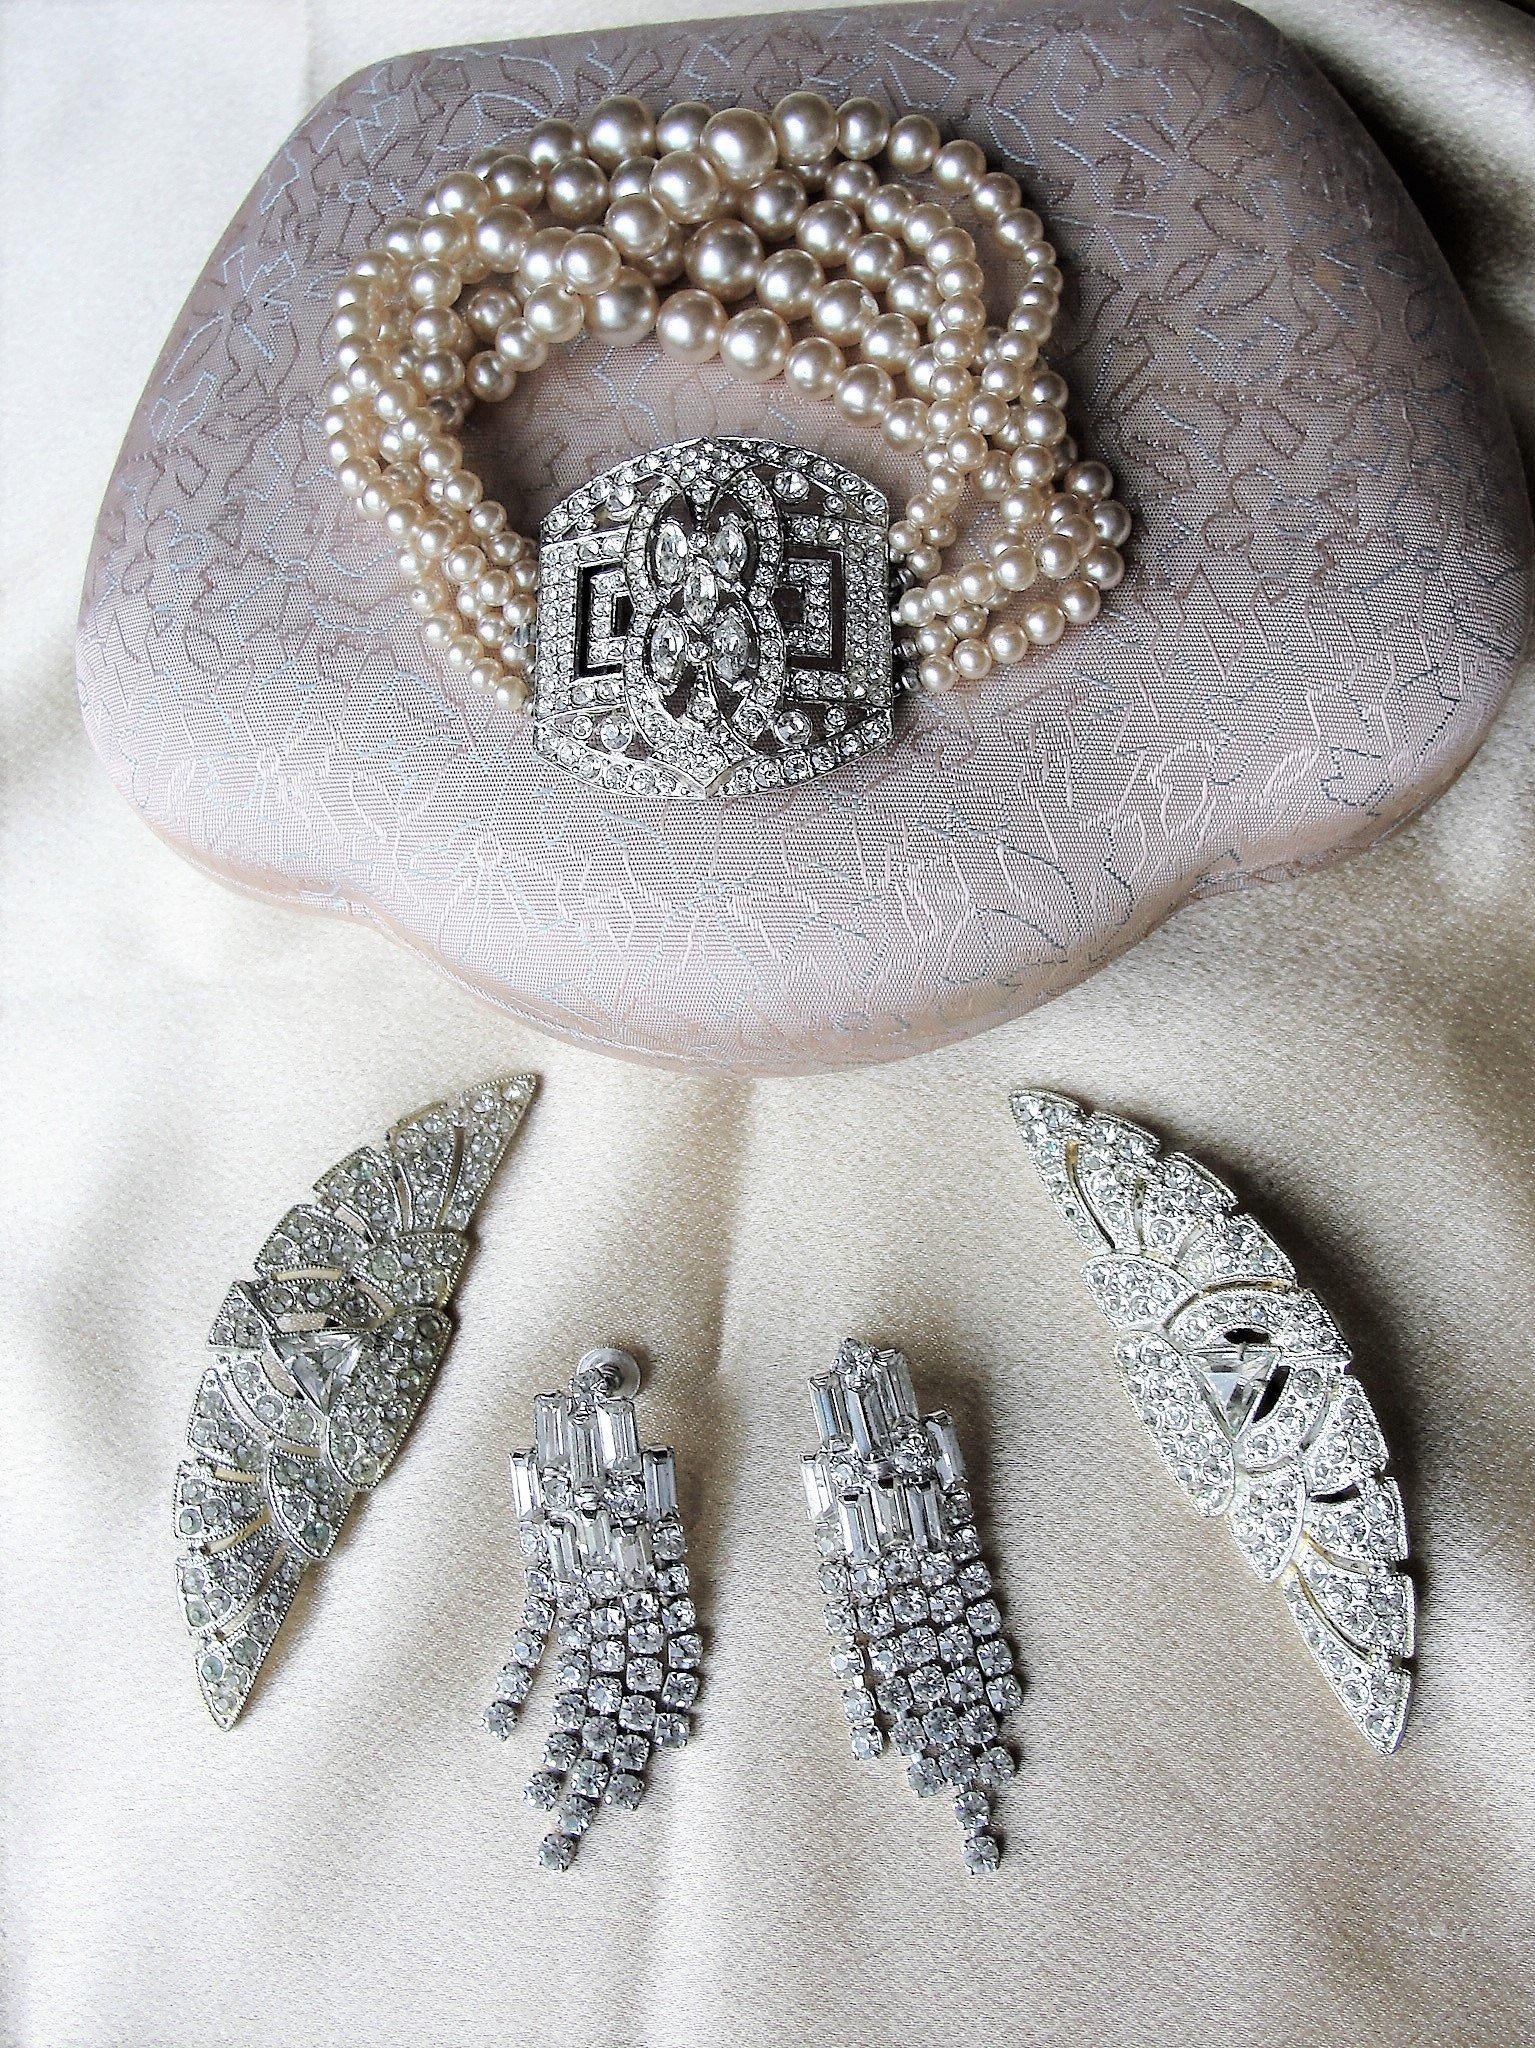 b2c2dd7a15 ANTIQUE Coro Art Deco Bracelet Rhinestones and Lustrous Pearls,Rhinestone  Vintage Jewelry,Designer Vintage Wedding Jewelry,Bridal Jewellery